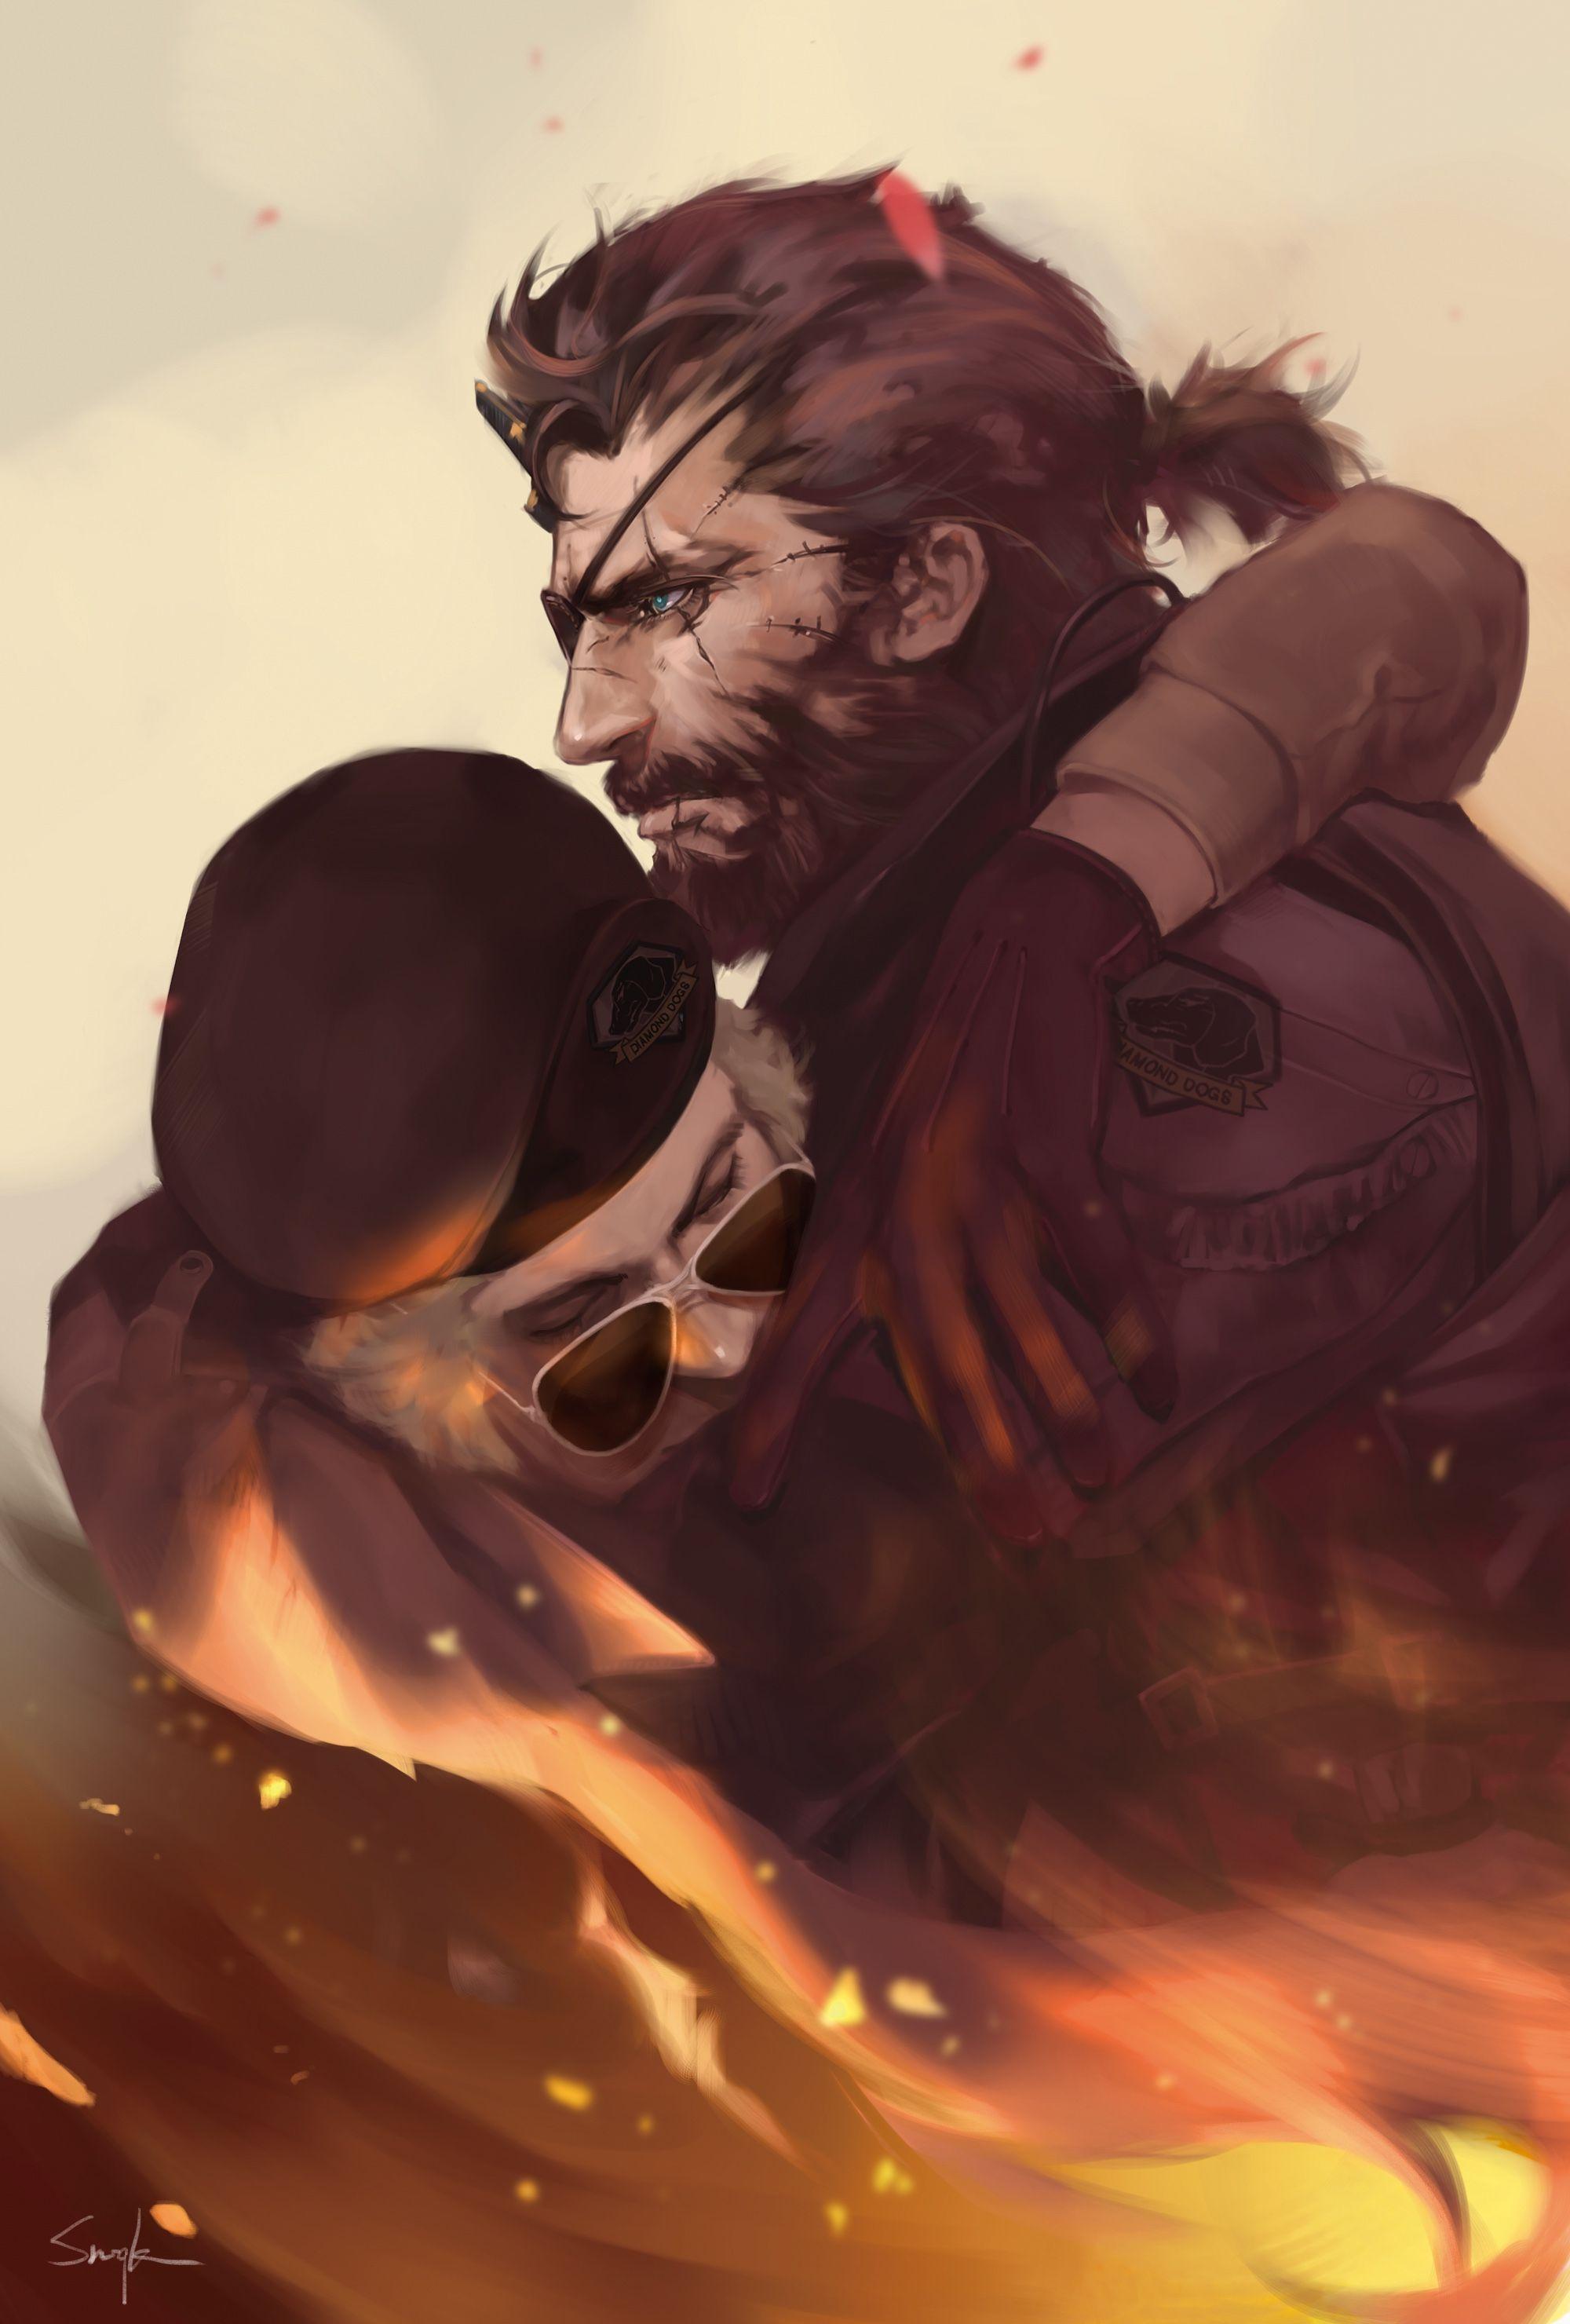 Mgsv Kazuhira Miller Venom Snake Metal Gear Metal Gear Solid Metal Gear Series Kazuhira miller's recent mobile wallpapers. mgsv kazuhira miller venom snake